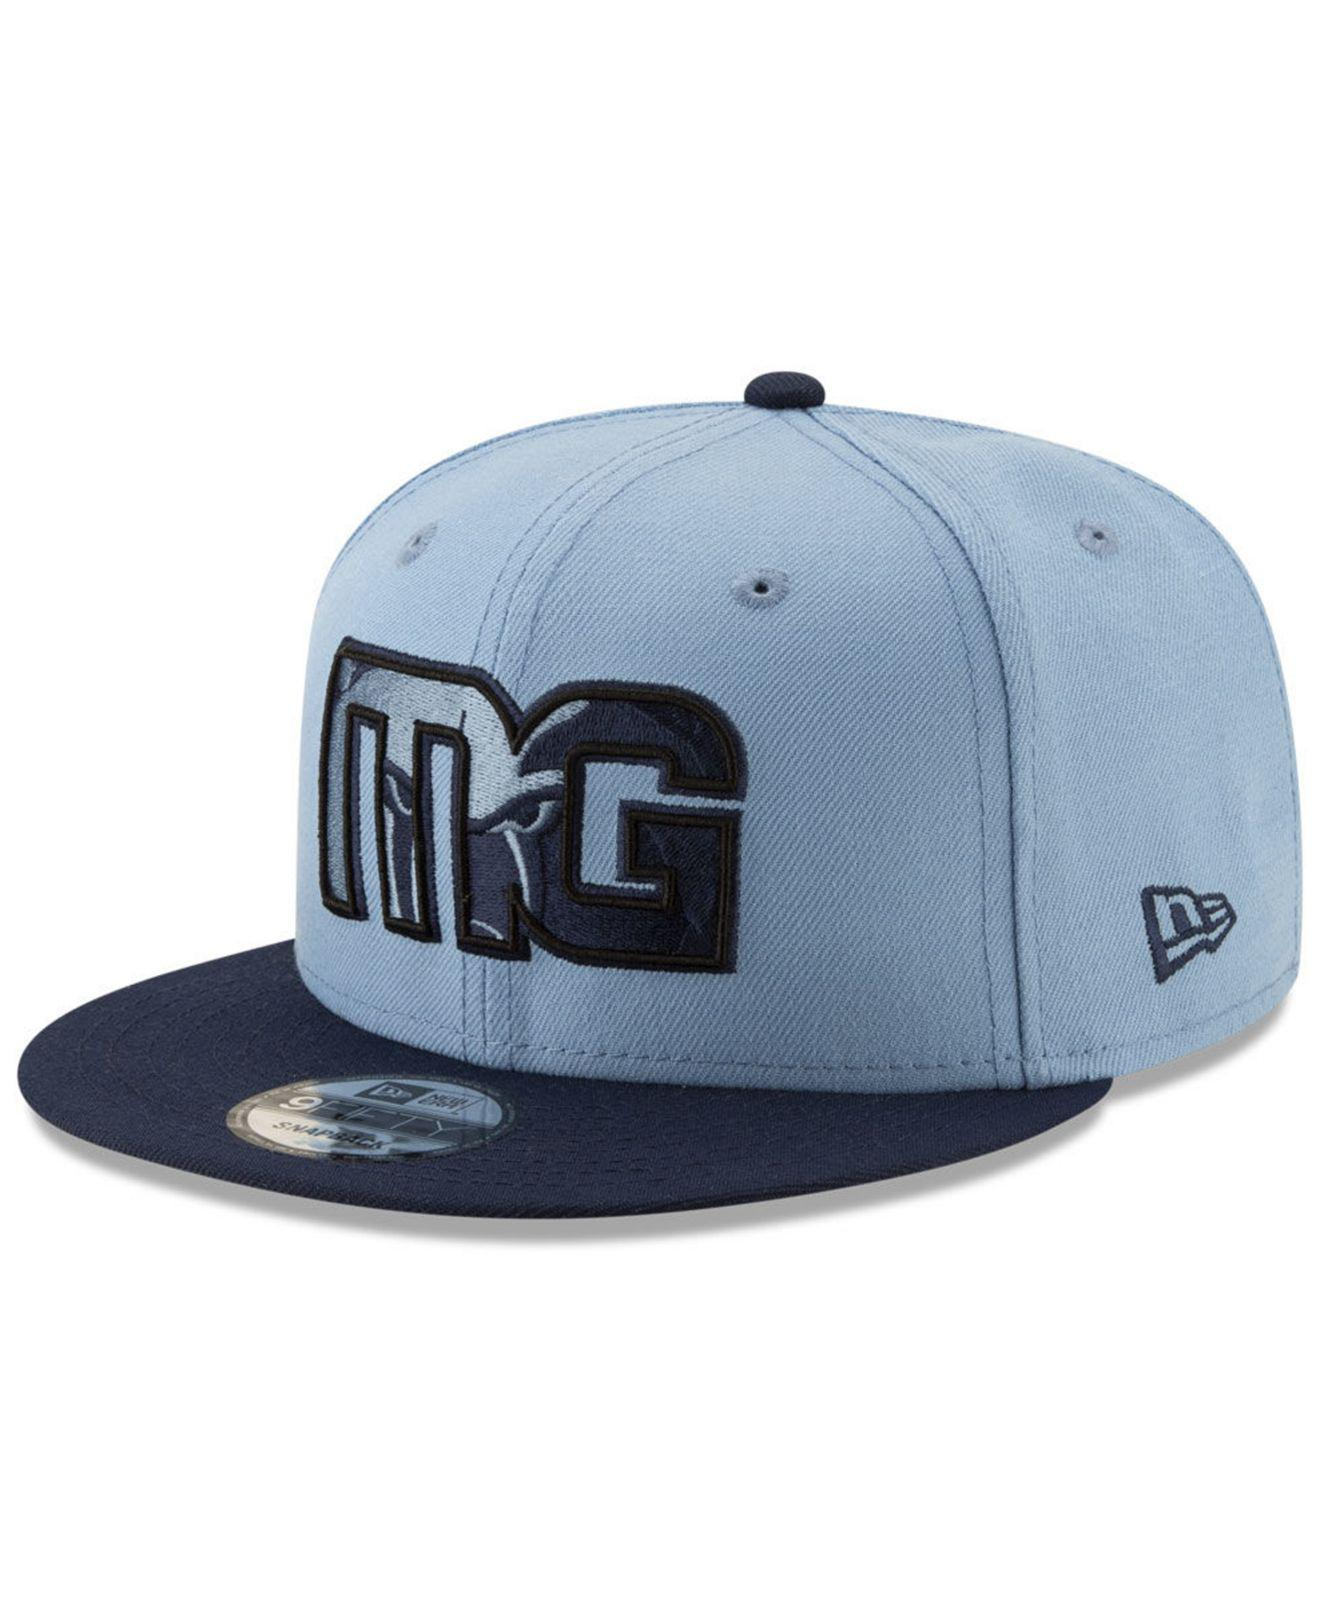 official photos f133a 55451 KTZ. Men s Blue Memphis Grizzlies Light City Combo 9fifty Snapback Cap